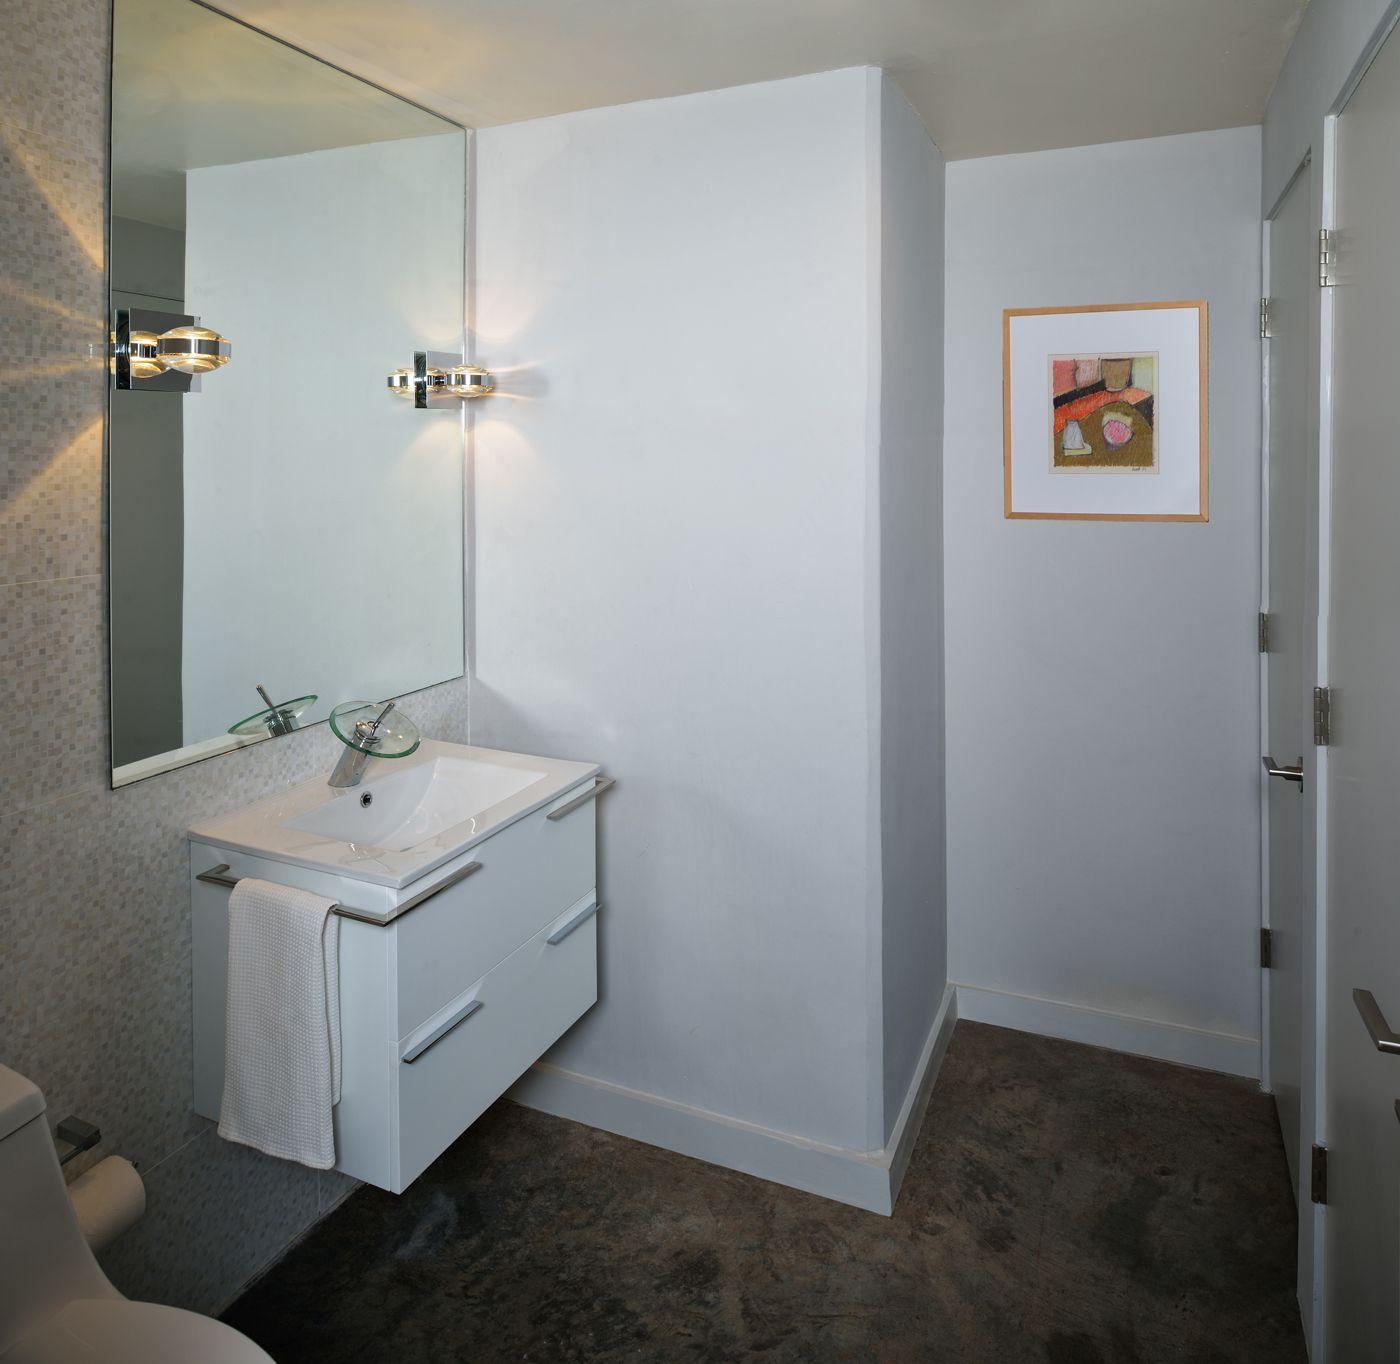 Descubre ideas sobre diseño de tocador powder room designed by wendt design group